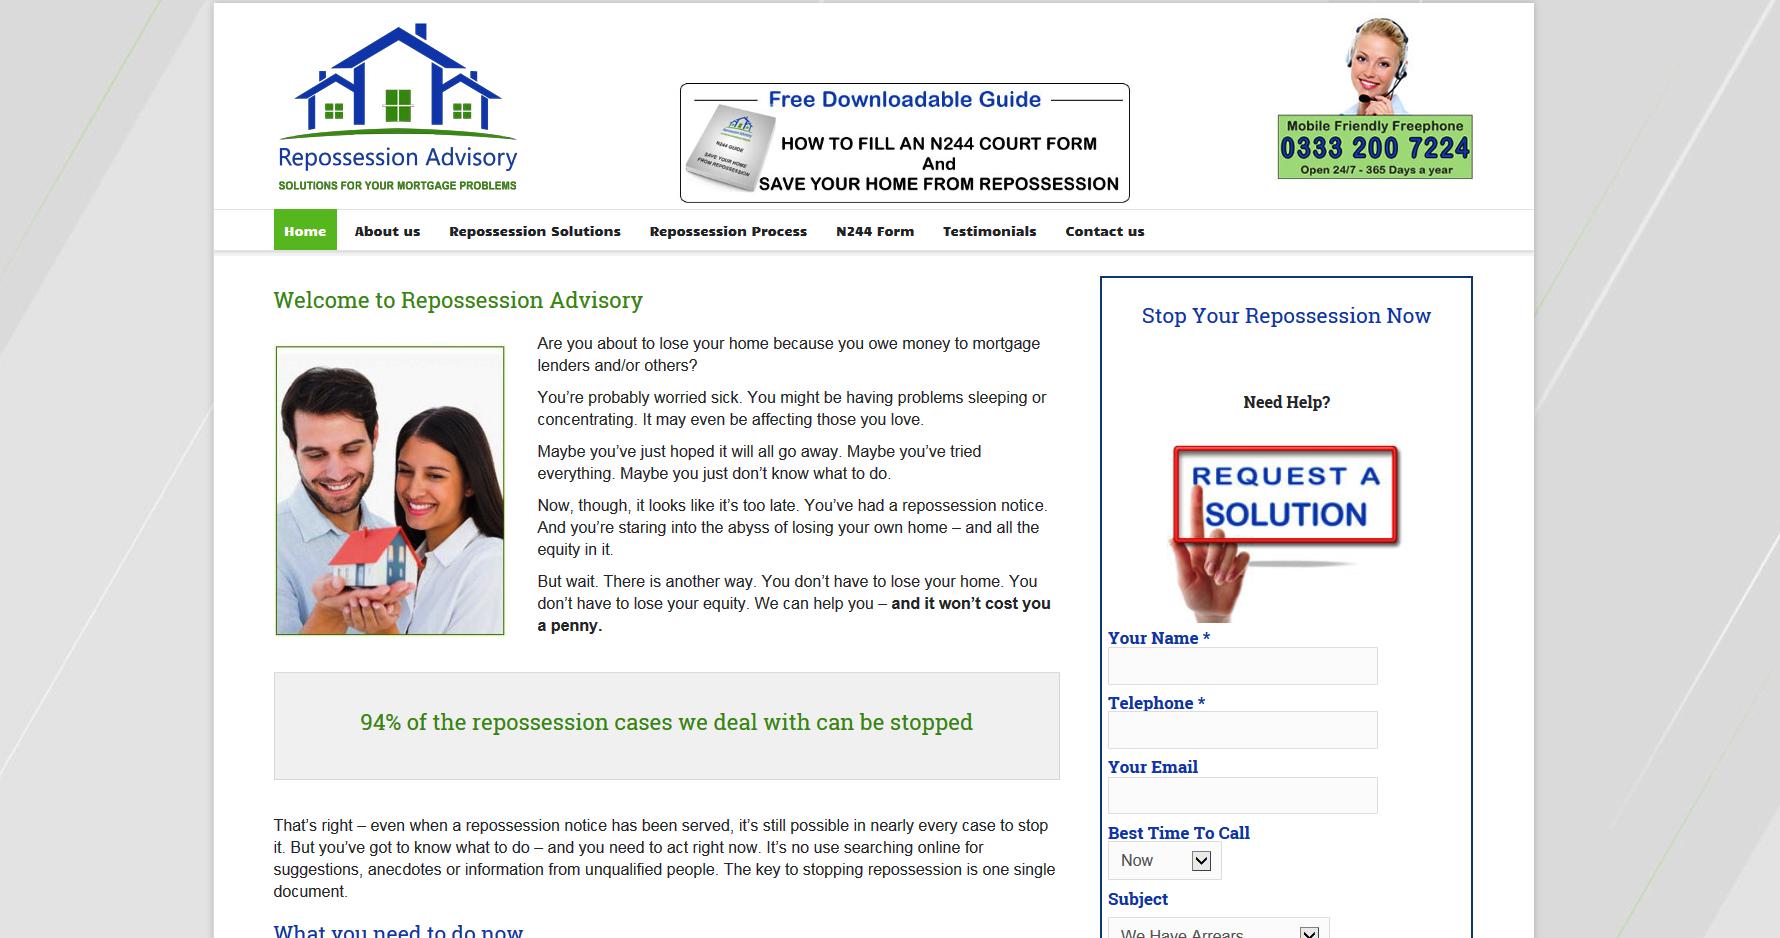 Repossession Advisory web page